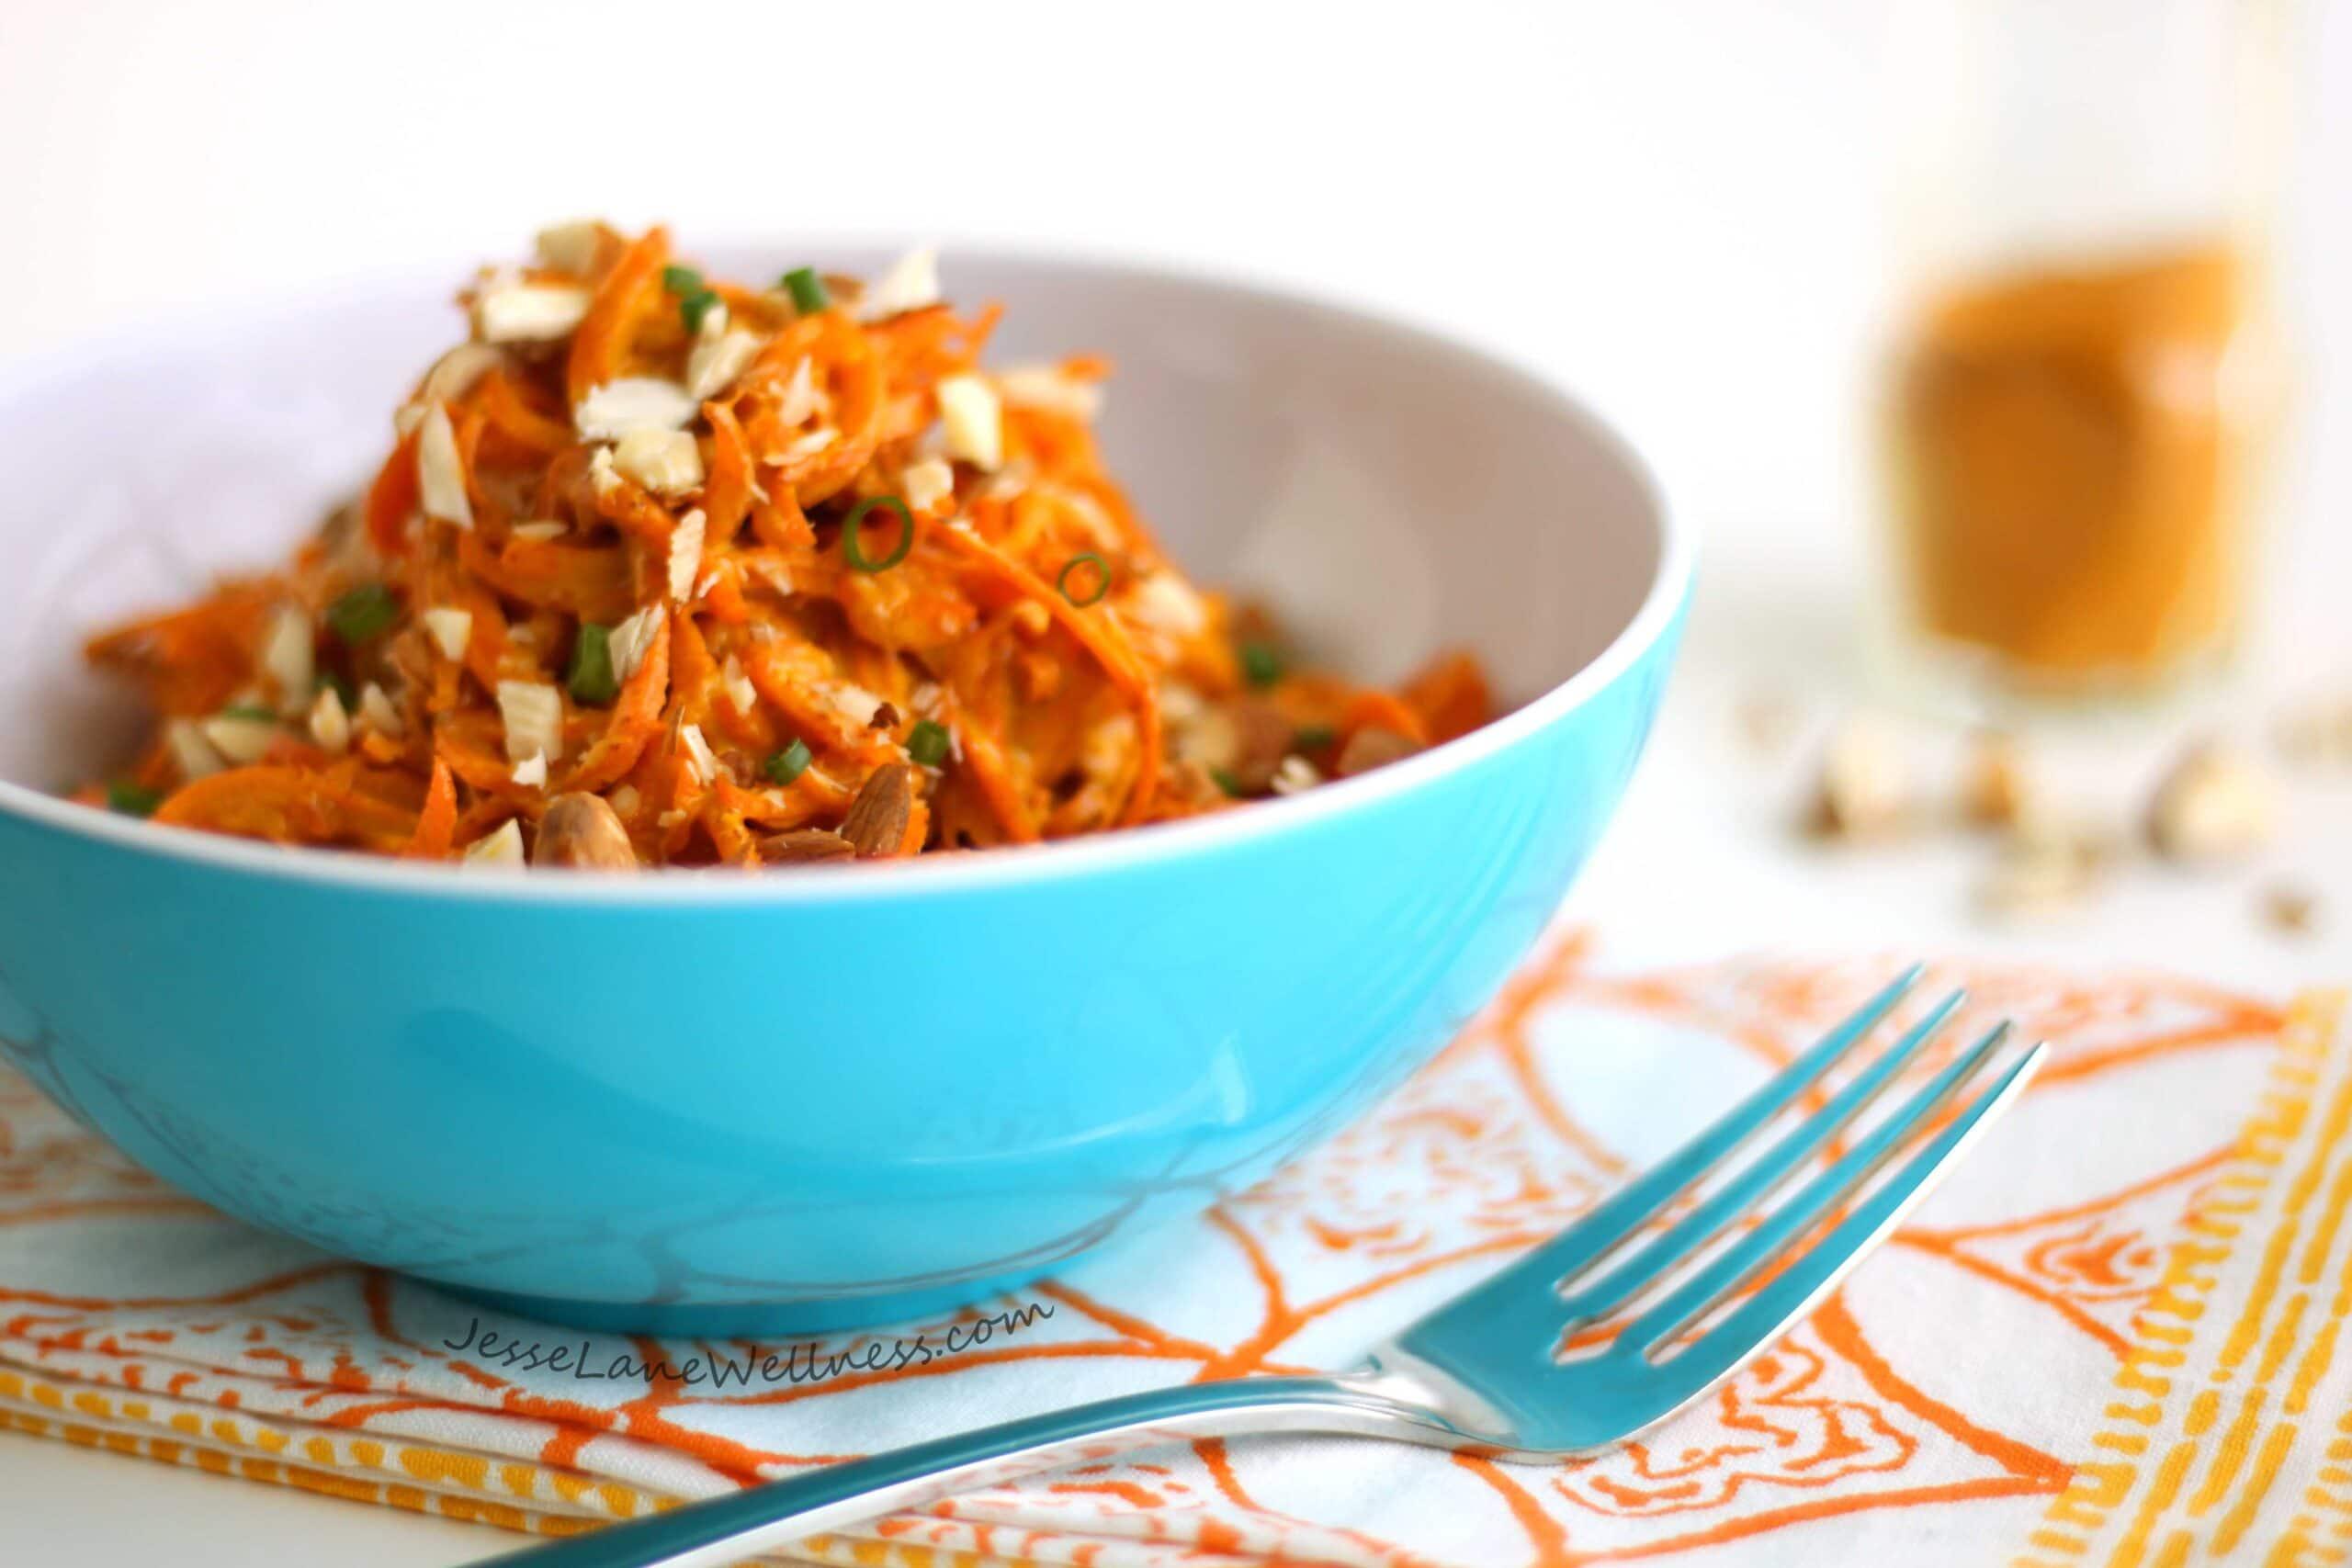 Creamy Turmeric Carrot Salad by @jesselwellness #antiinflammatory #carrot